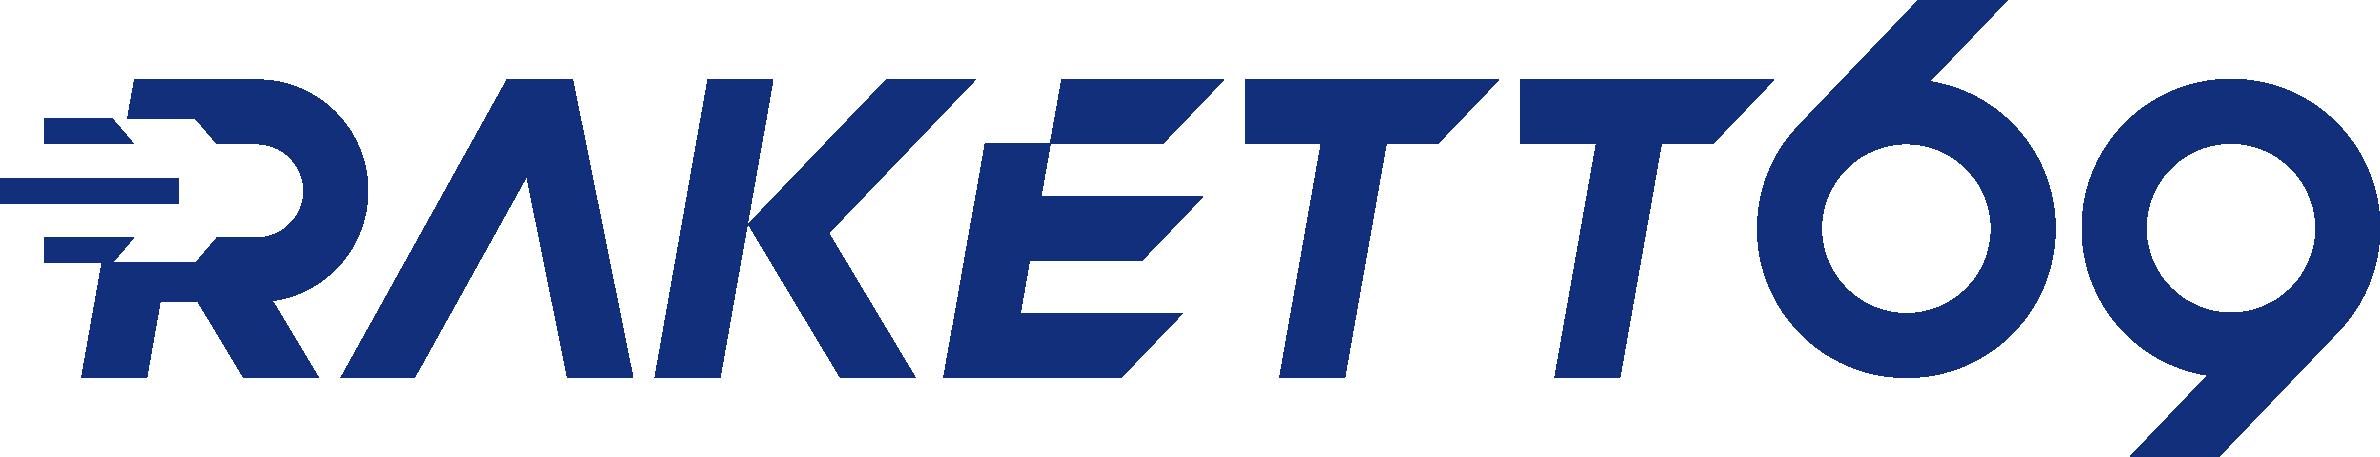 Rakett 69 - ETV